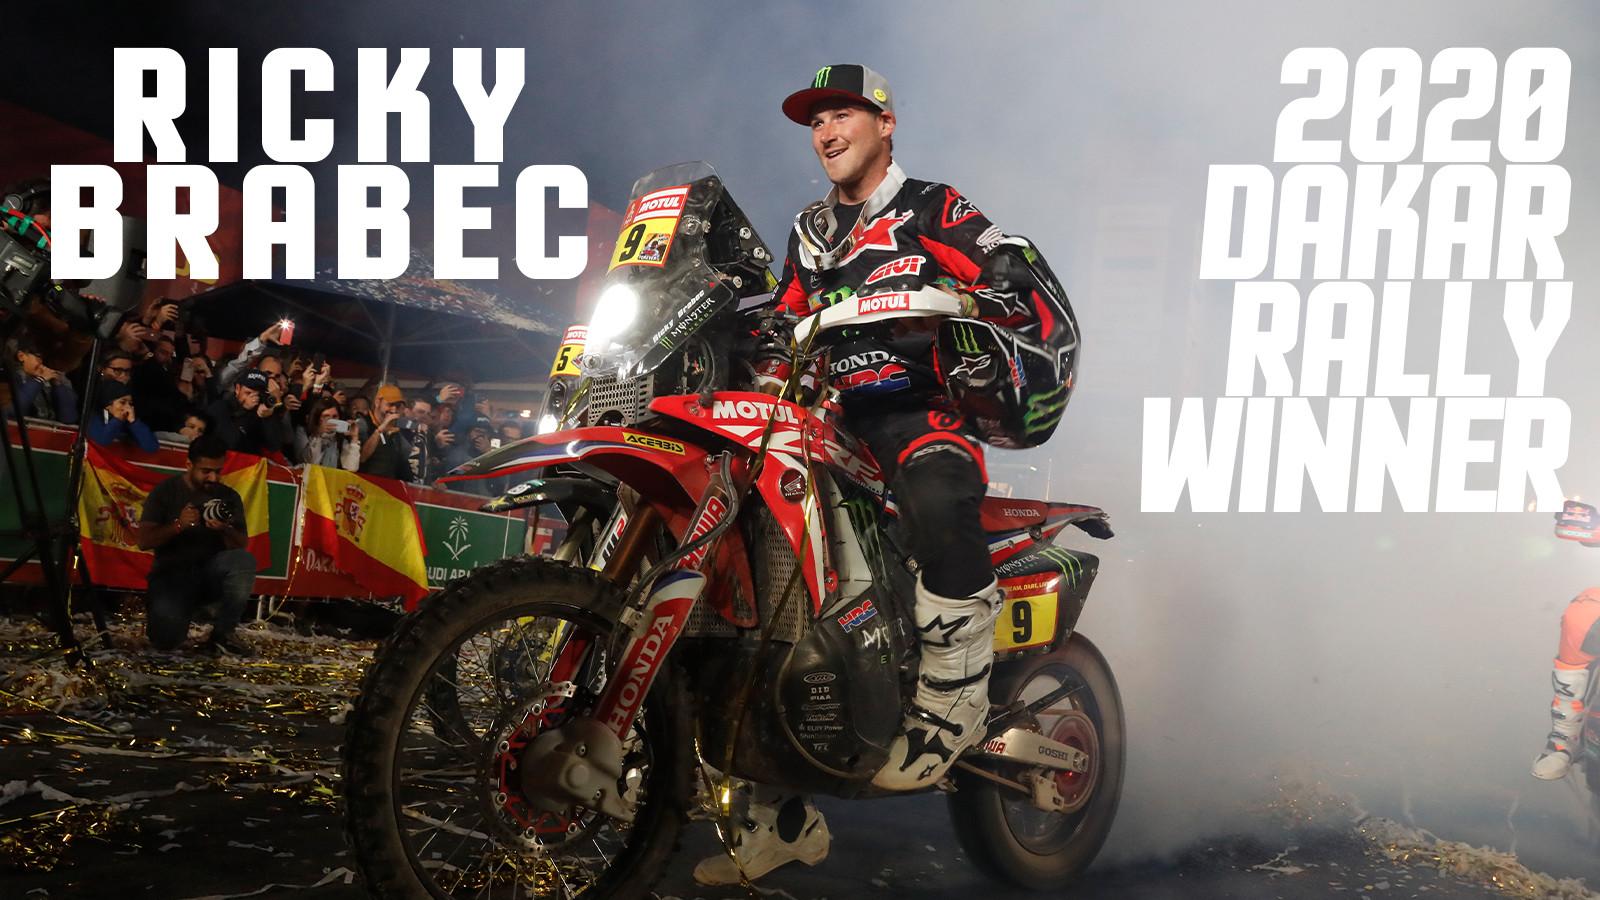 Ricky Brabec 2020 Dakar Rally Winner